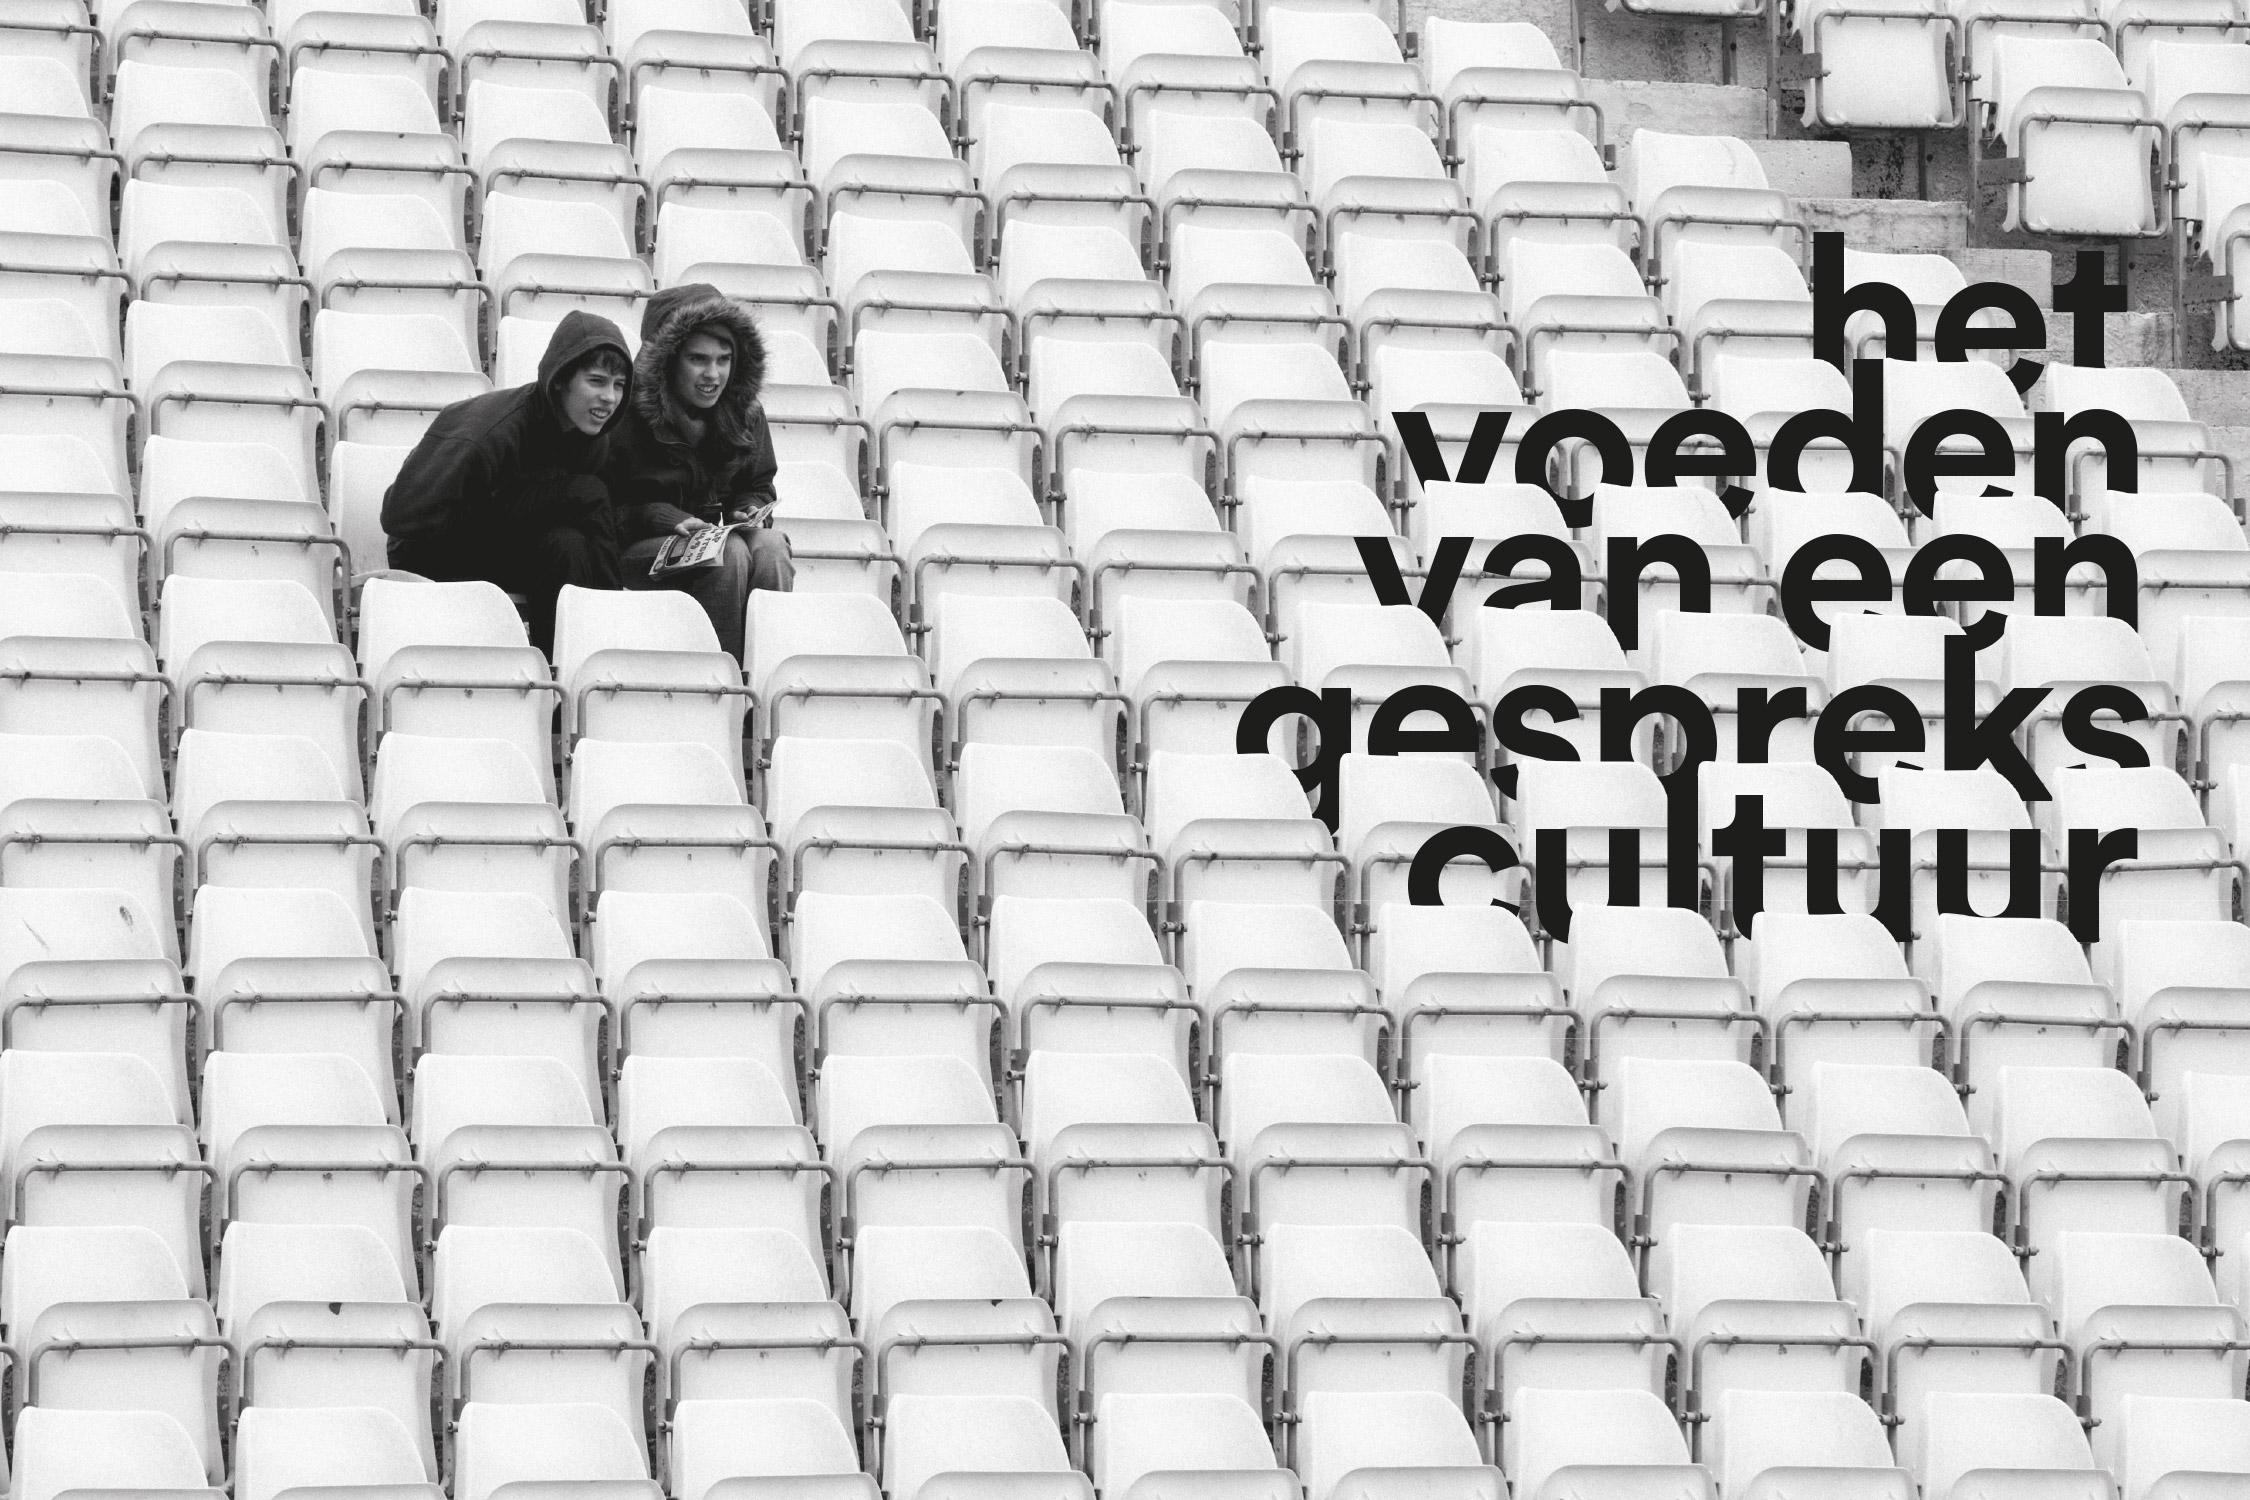 - I. de Jong